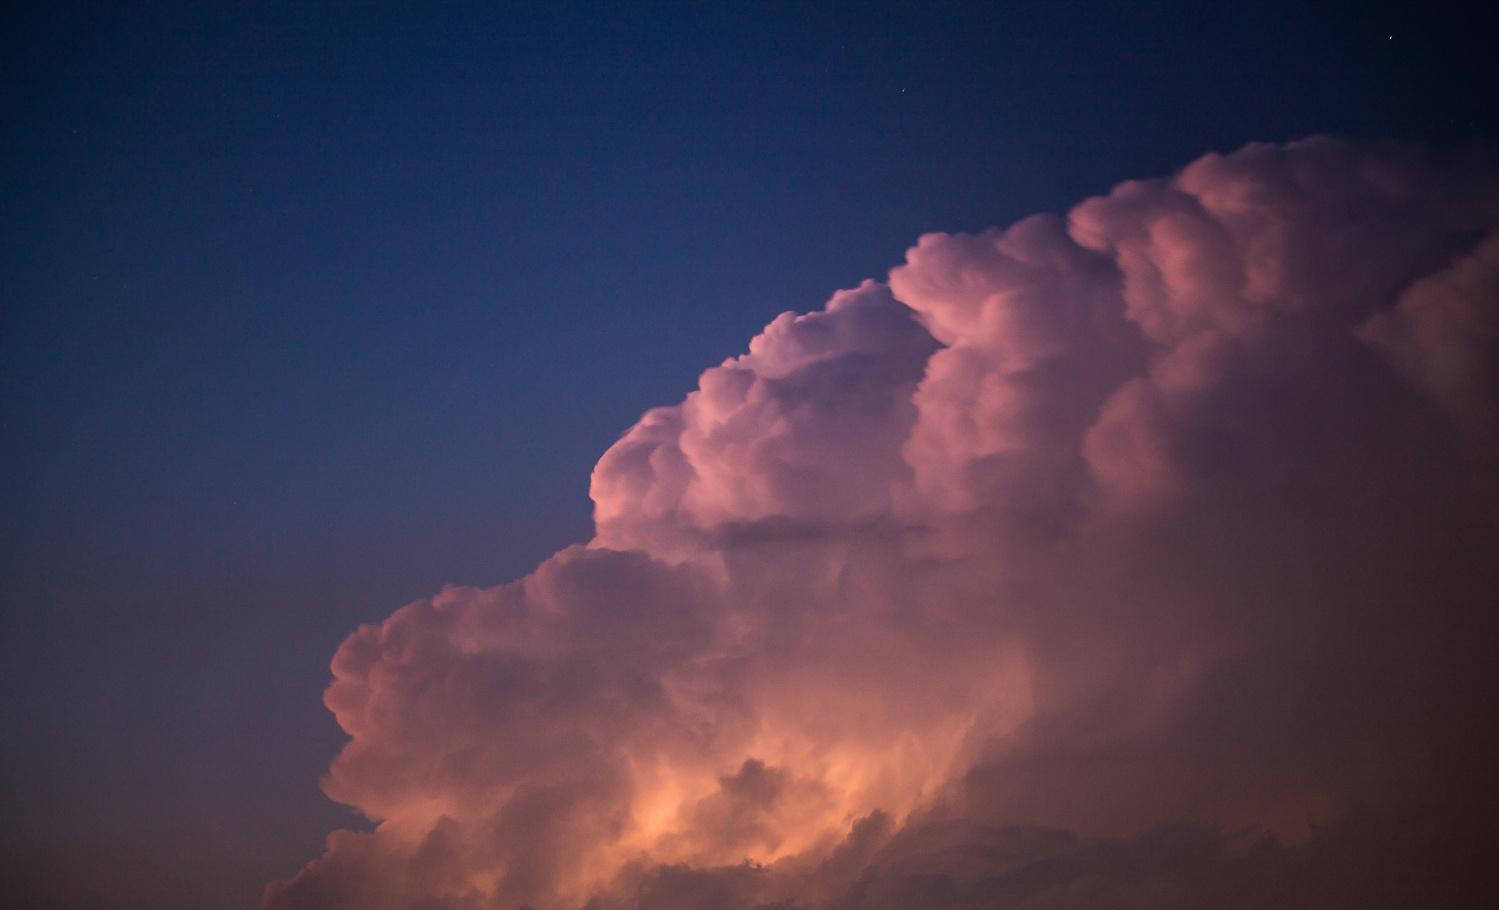 Lightening Storm by Cameron McGrath